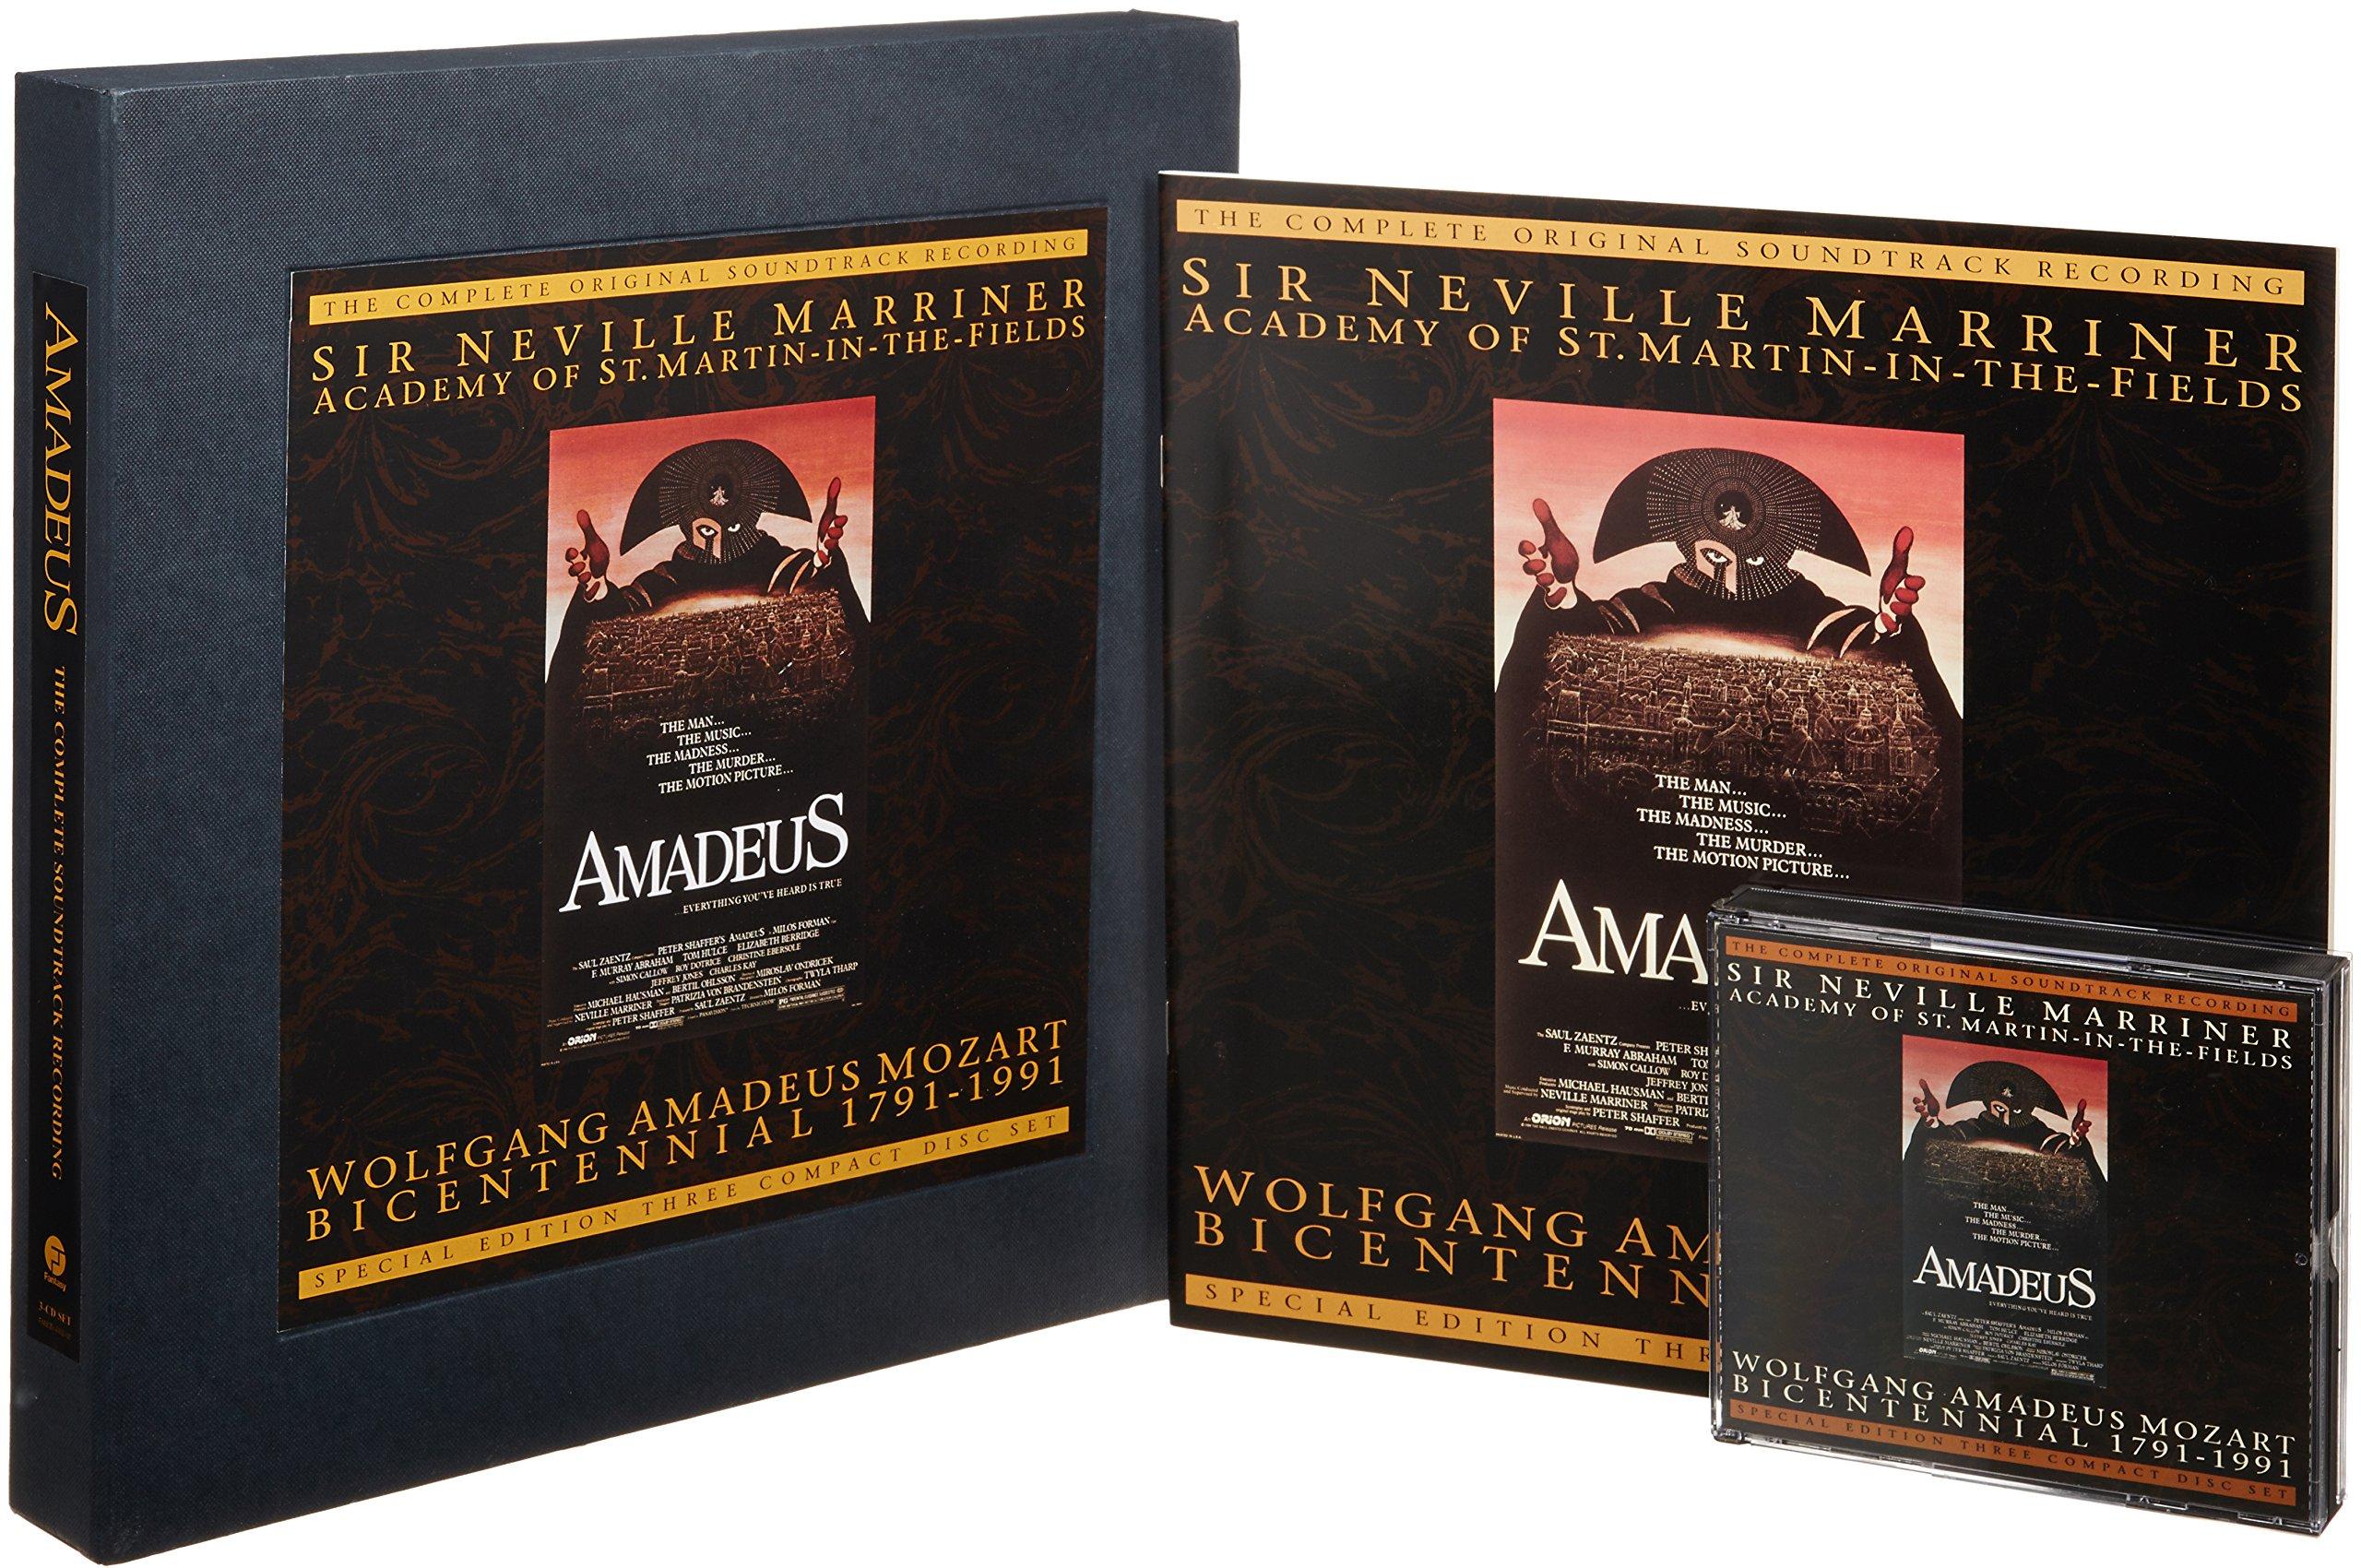 Amadeus: The Complete Original Soundtrack Recording by Fantasy